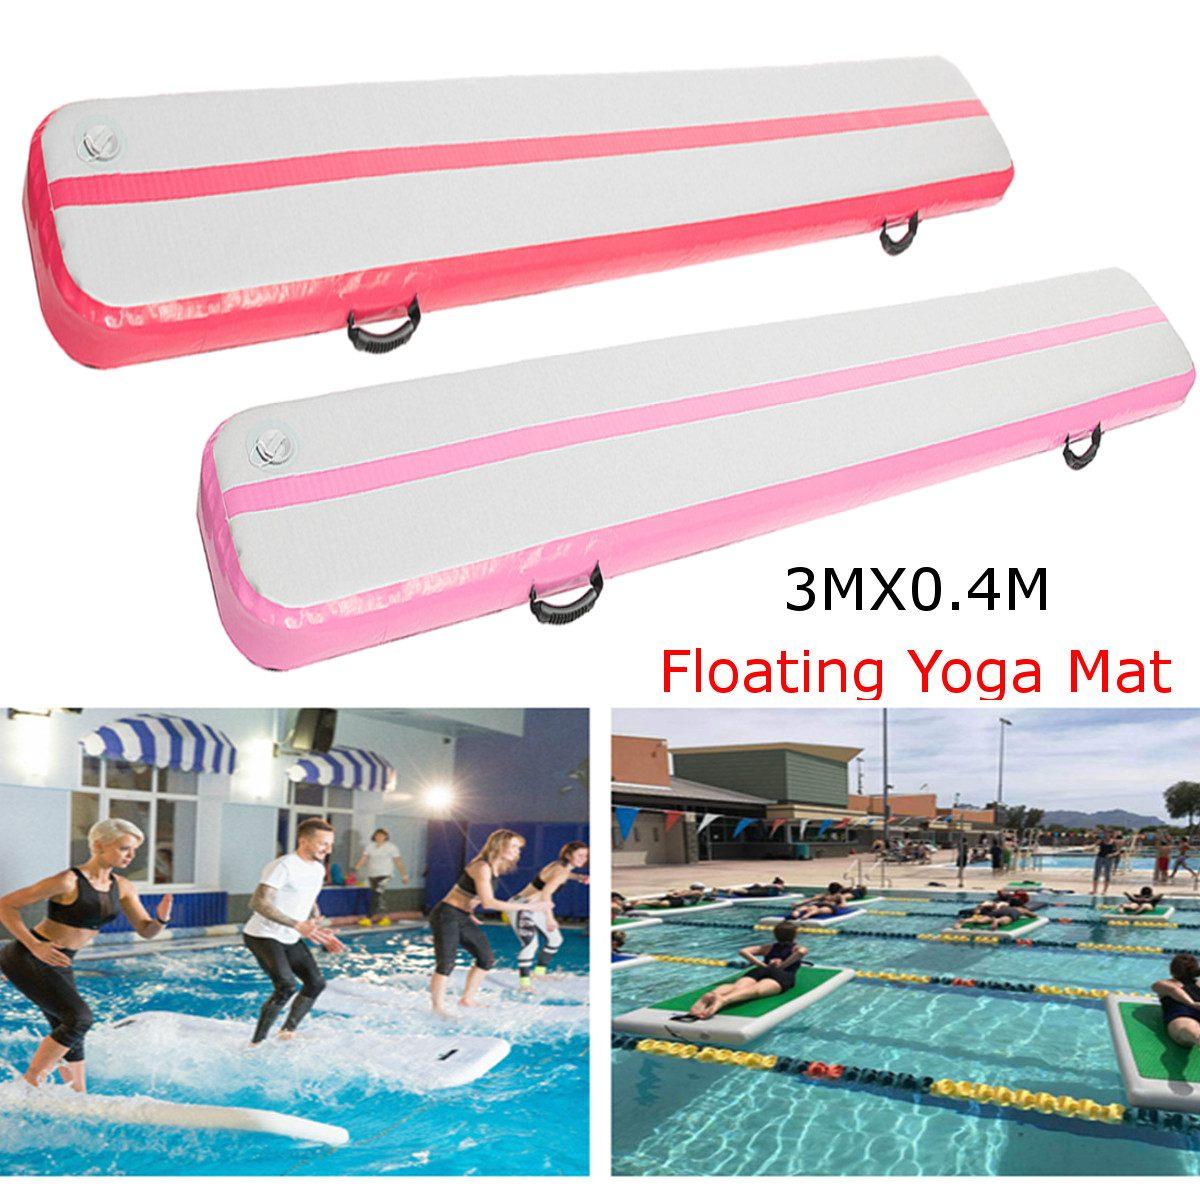 300*40*15 cm gonflable flottant Airtrack tapis de gymnastique Air Tumbling gonflable GYM Air piste tapis - 3